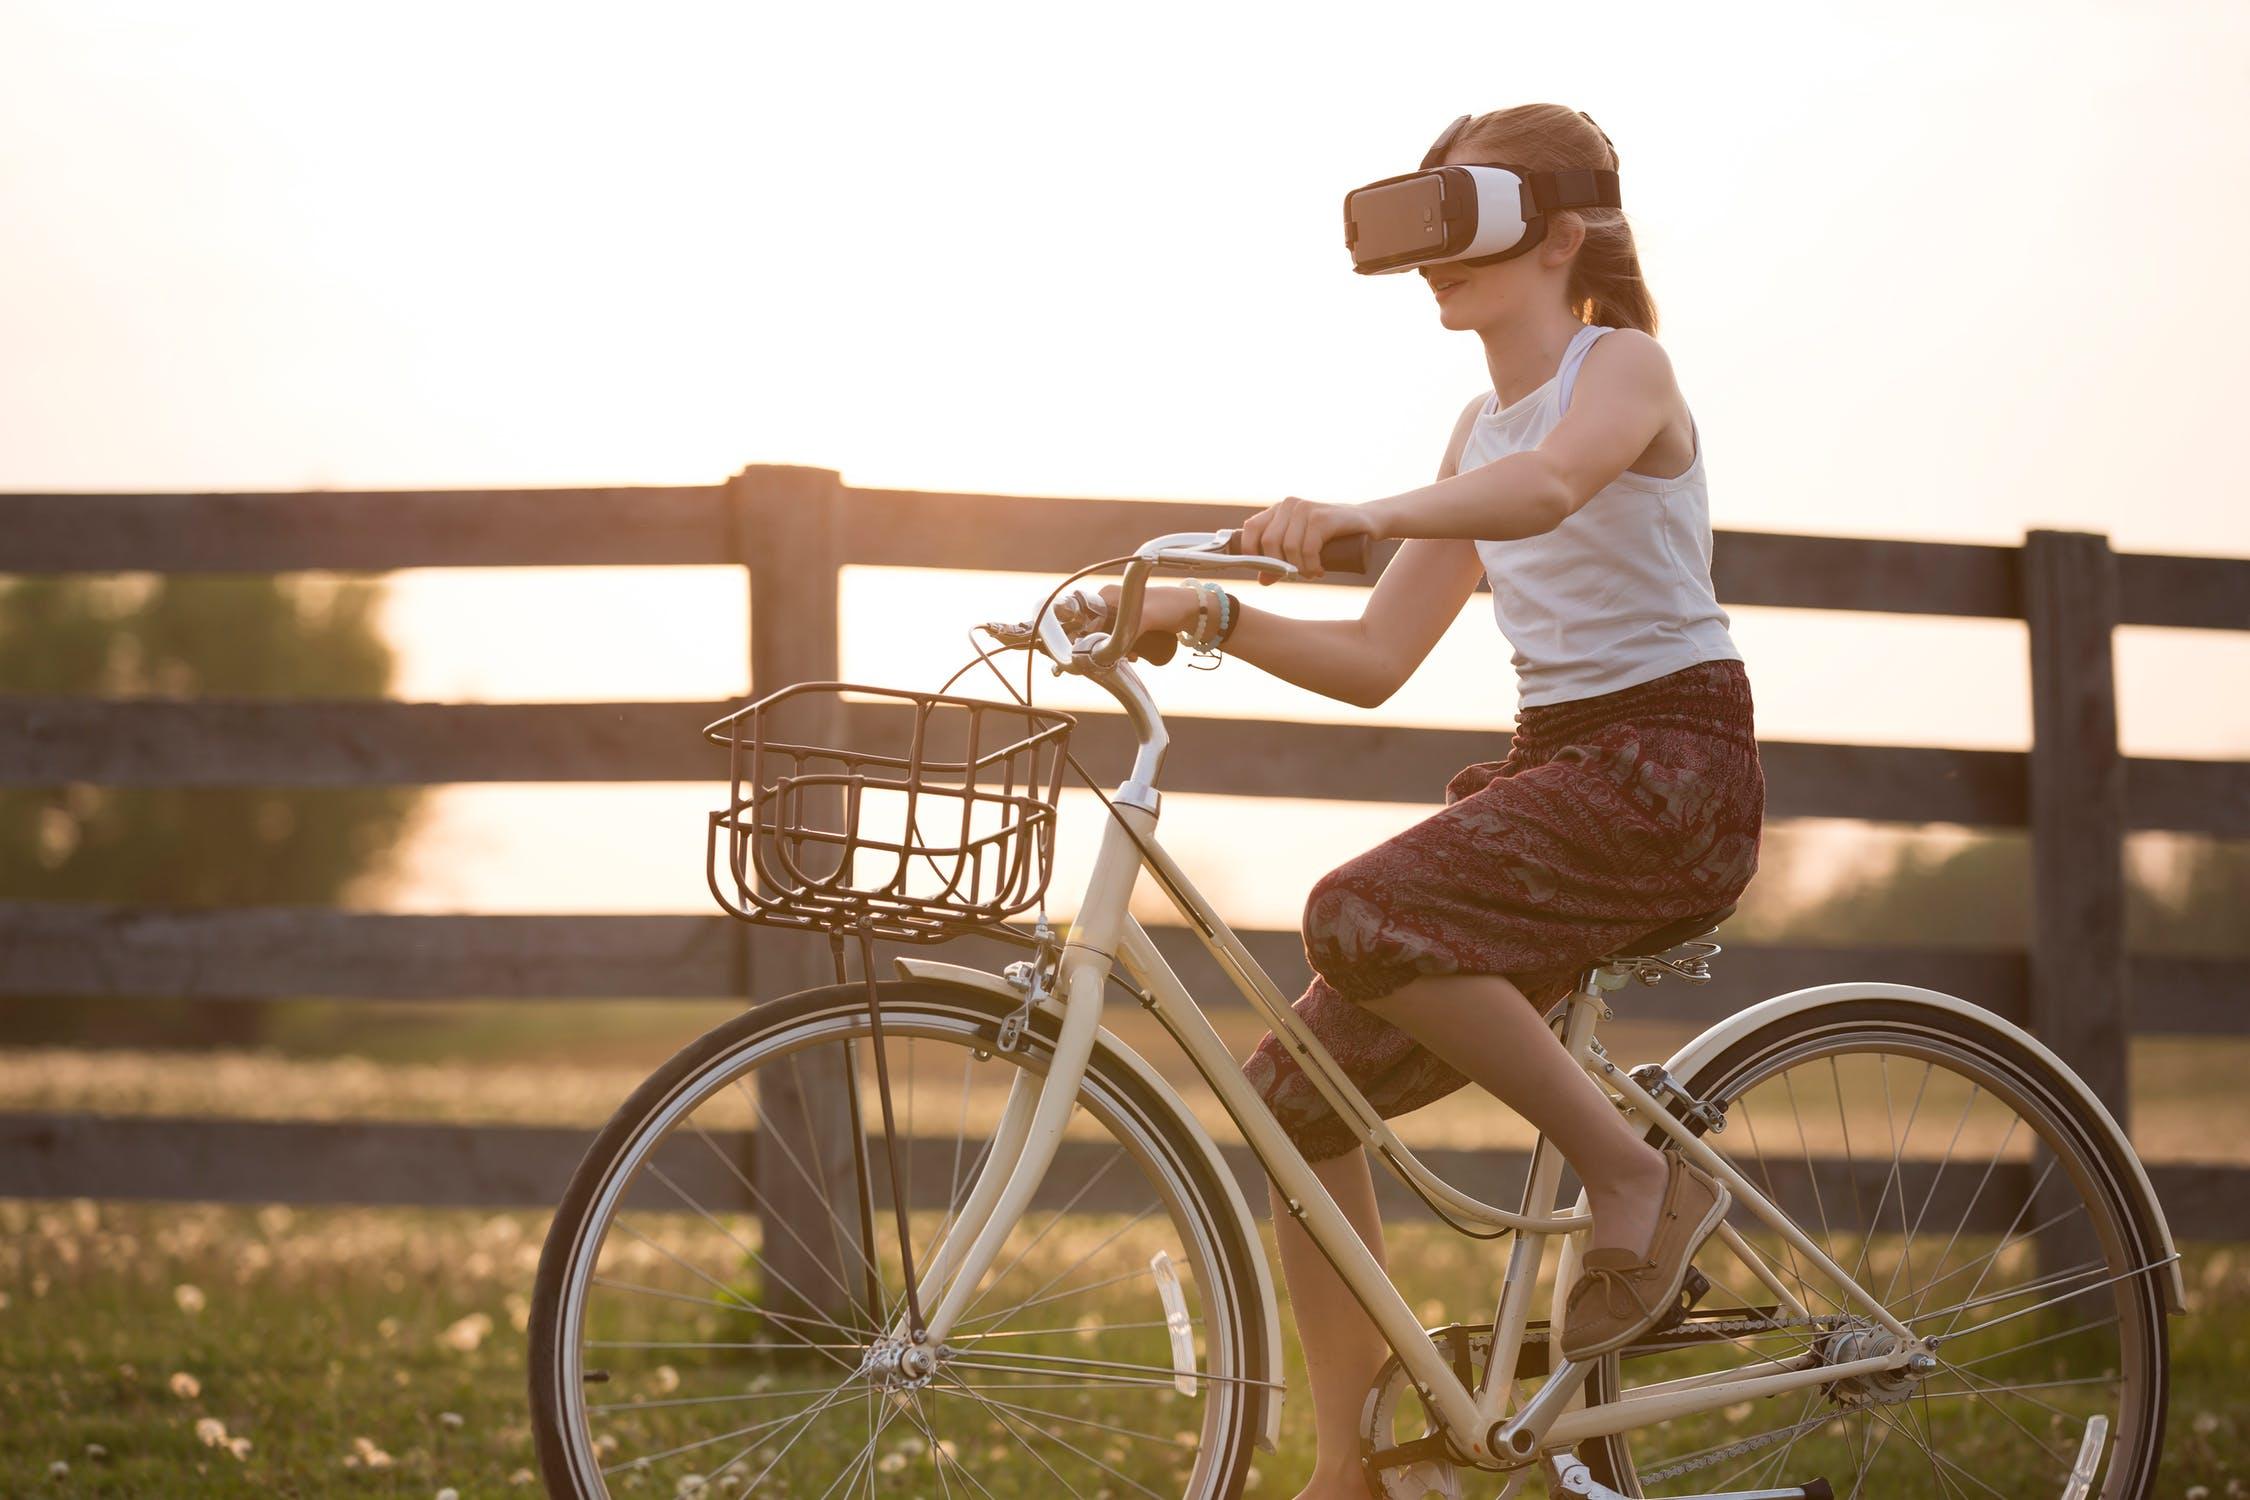 tech-changing-life-dangerous-ways-moral-health-decline